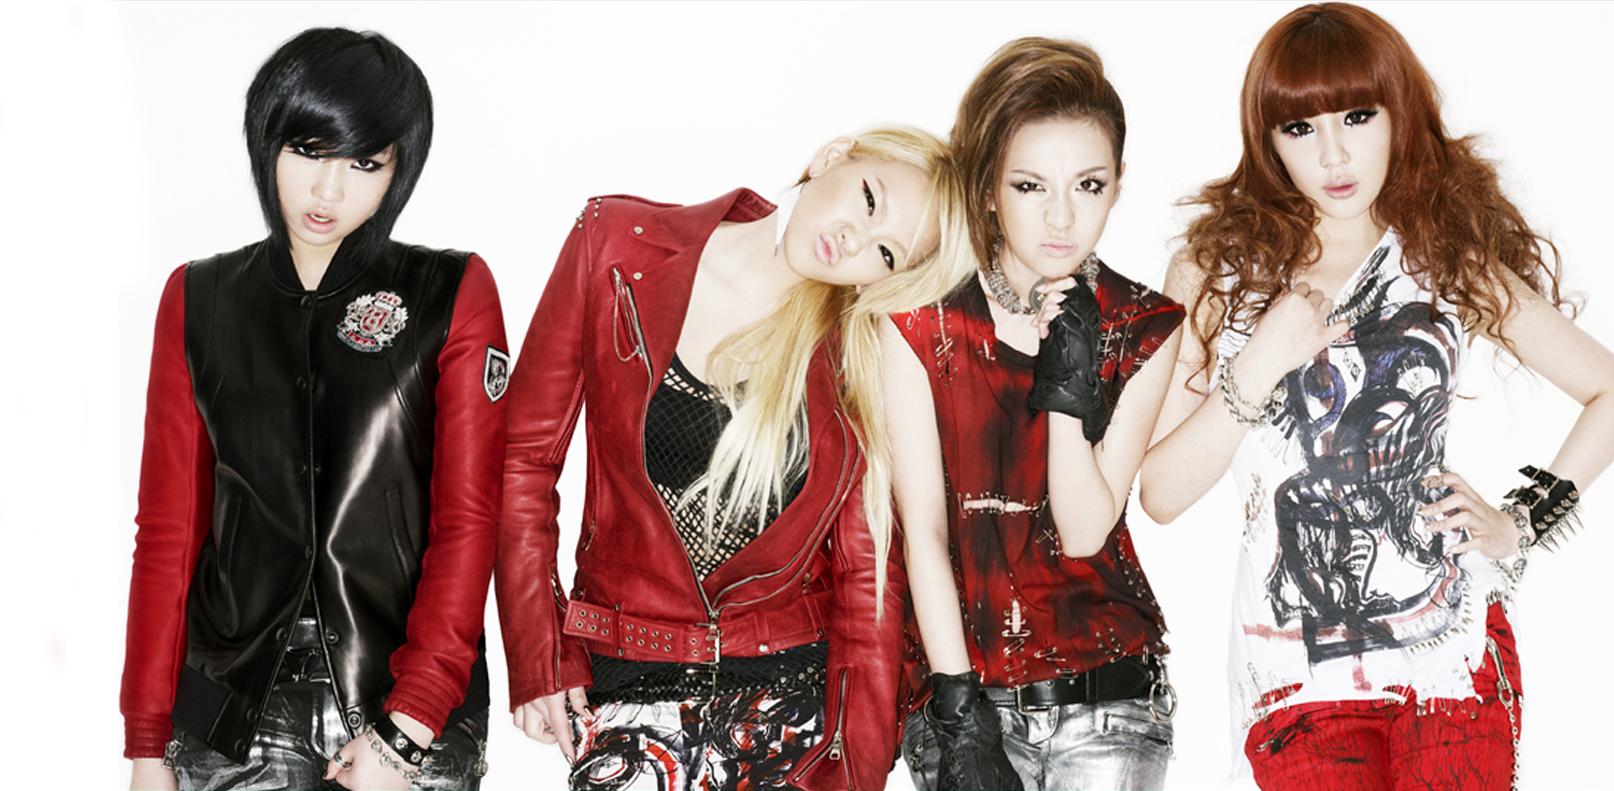 #Mnzy #CL #Dara #Bom #2NE1   Modelos, Kpop, Artstas